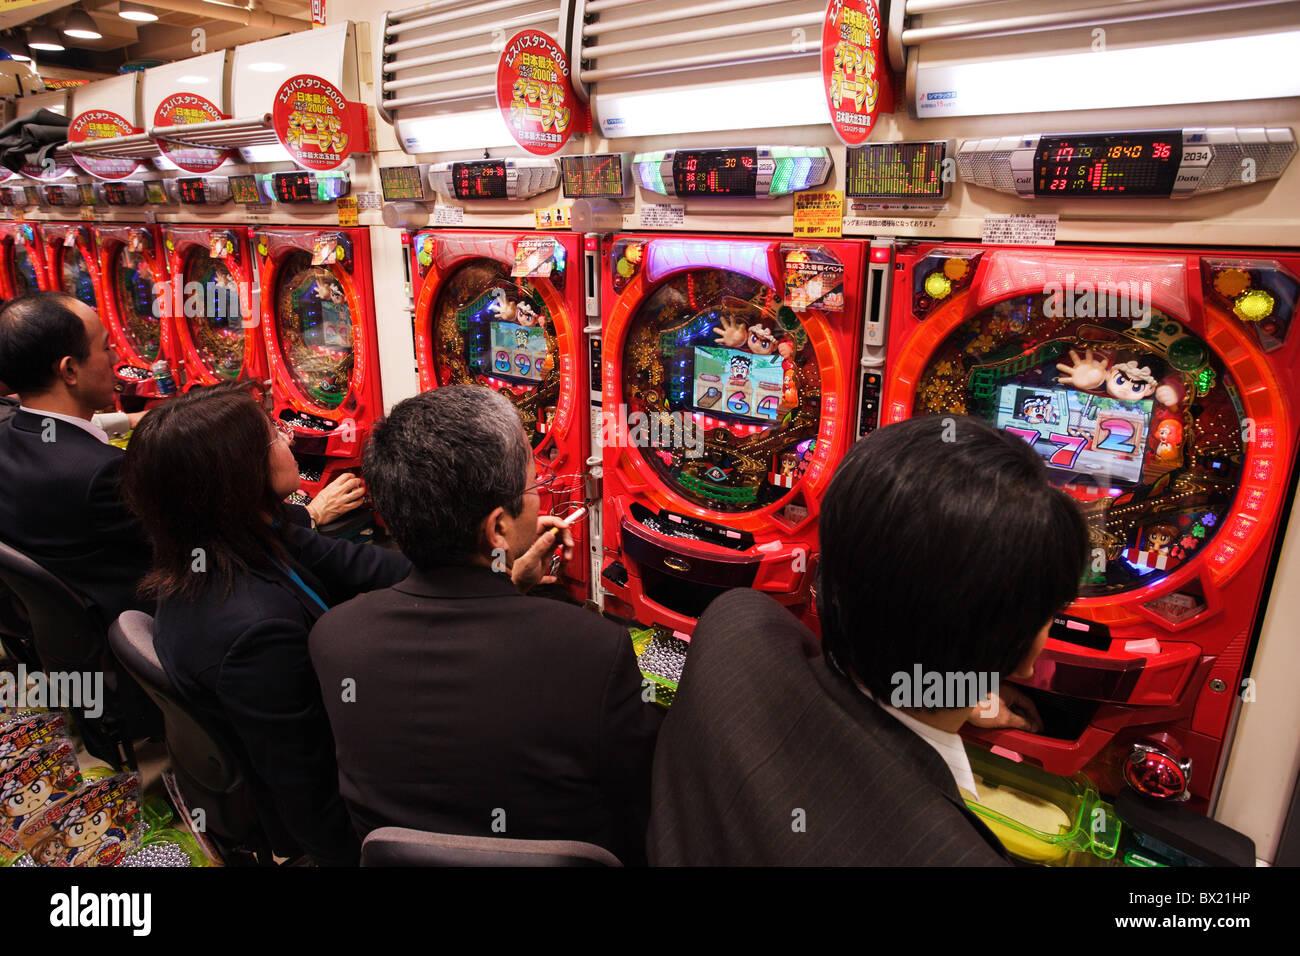 Gta online casino best slot machine